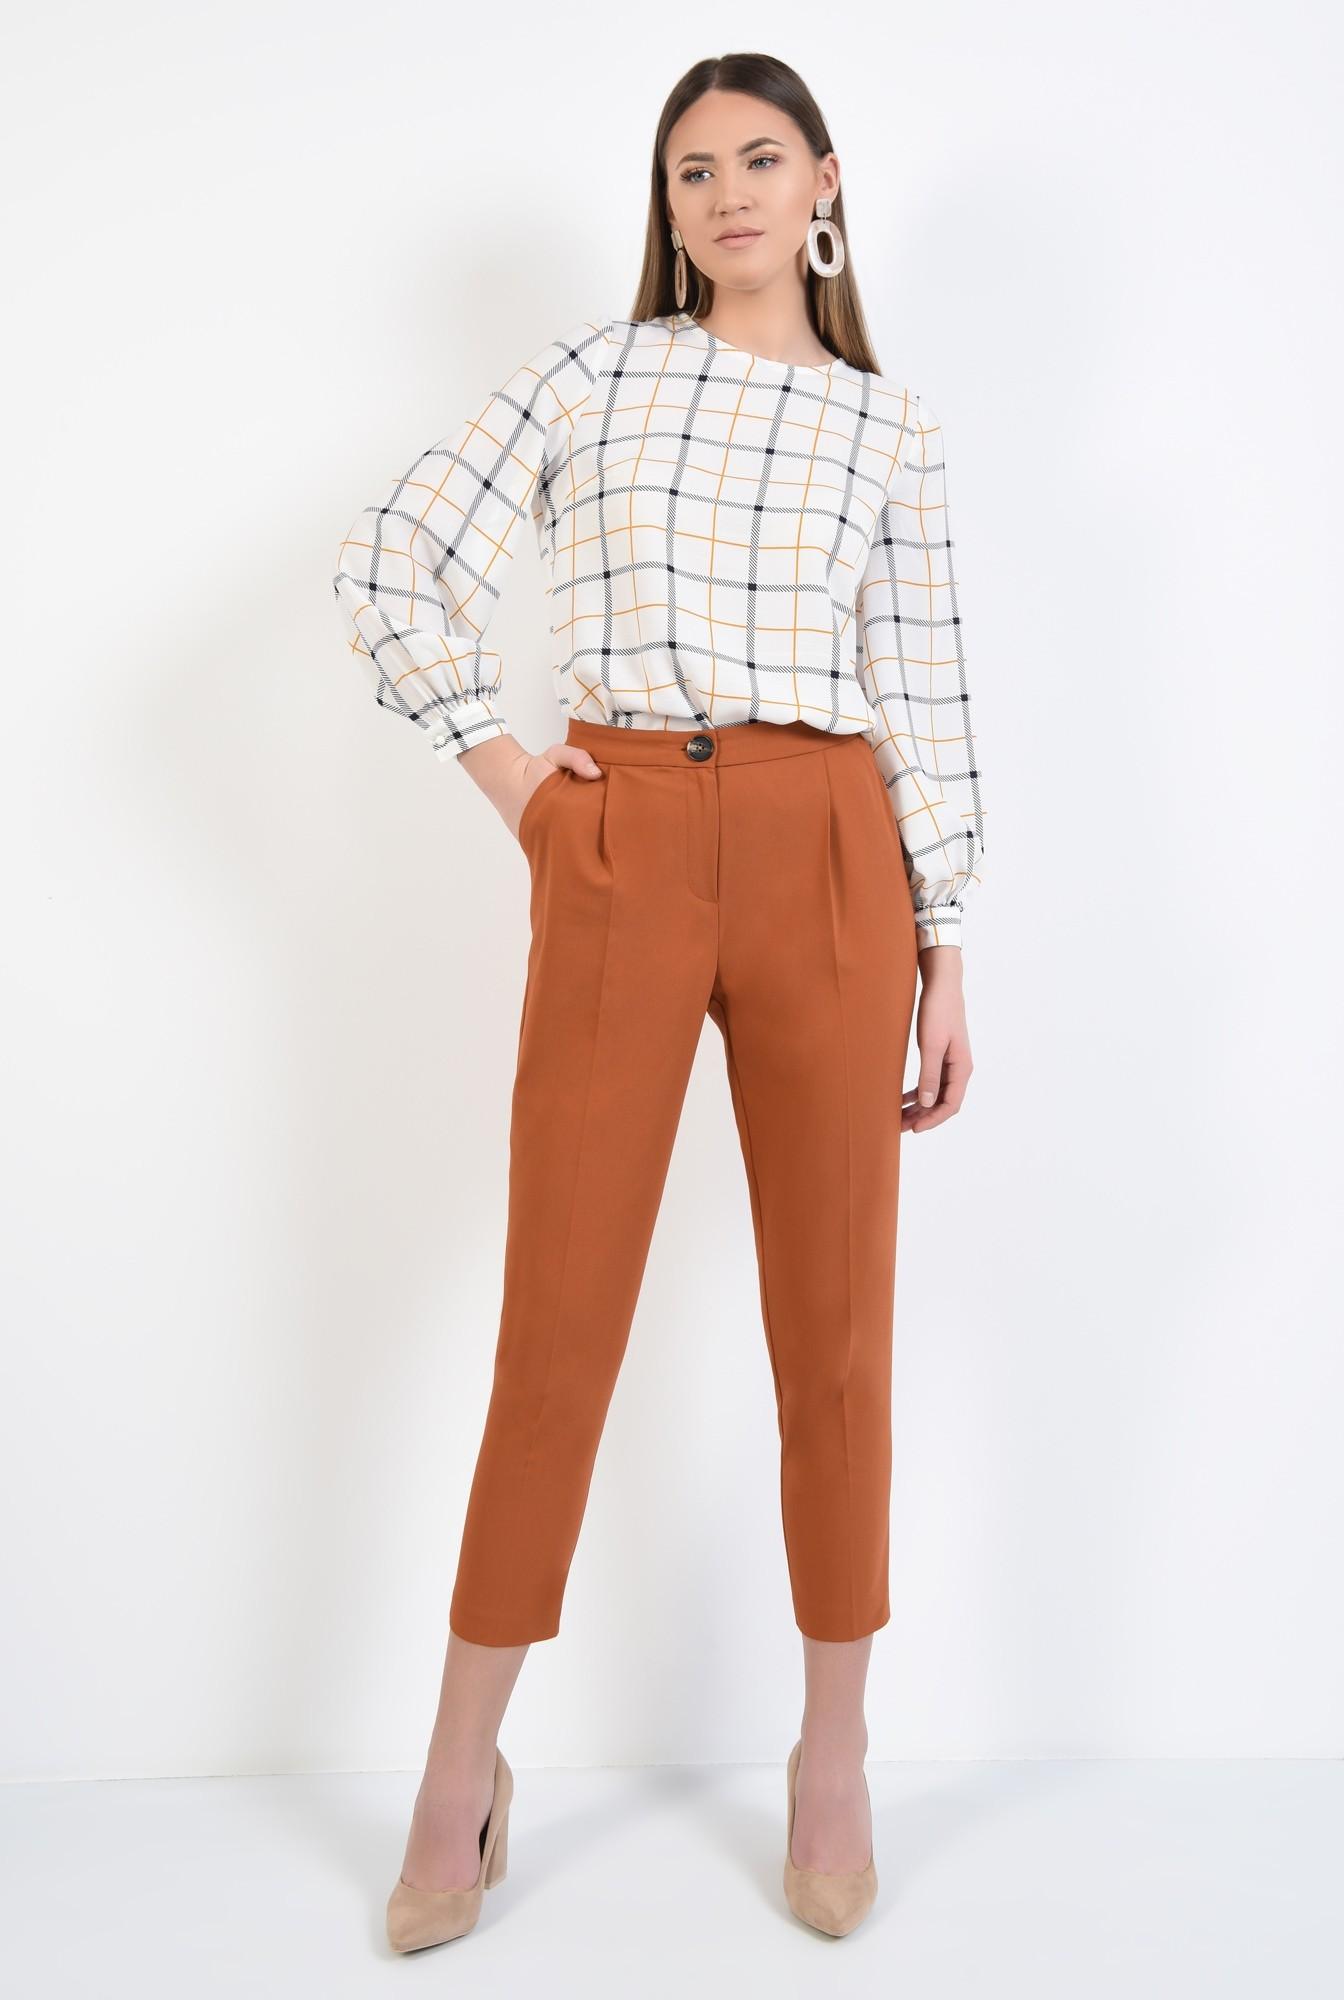 3 - bluza de zi, alba, imprimeu carouri, maneci lungi cu manseta